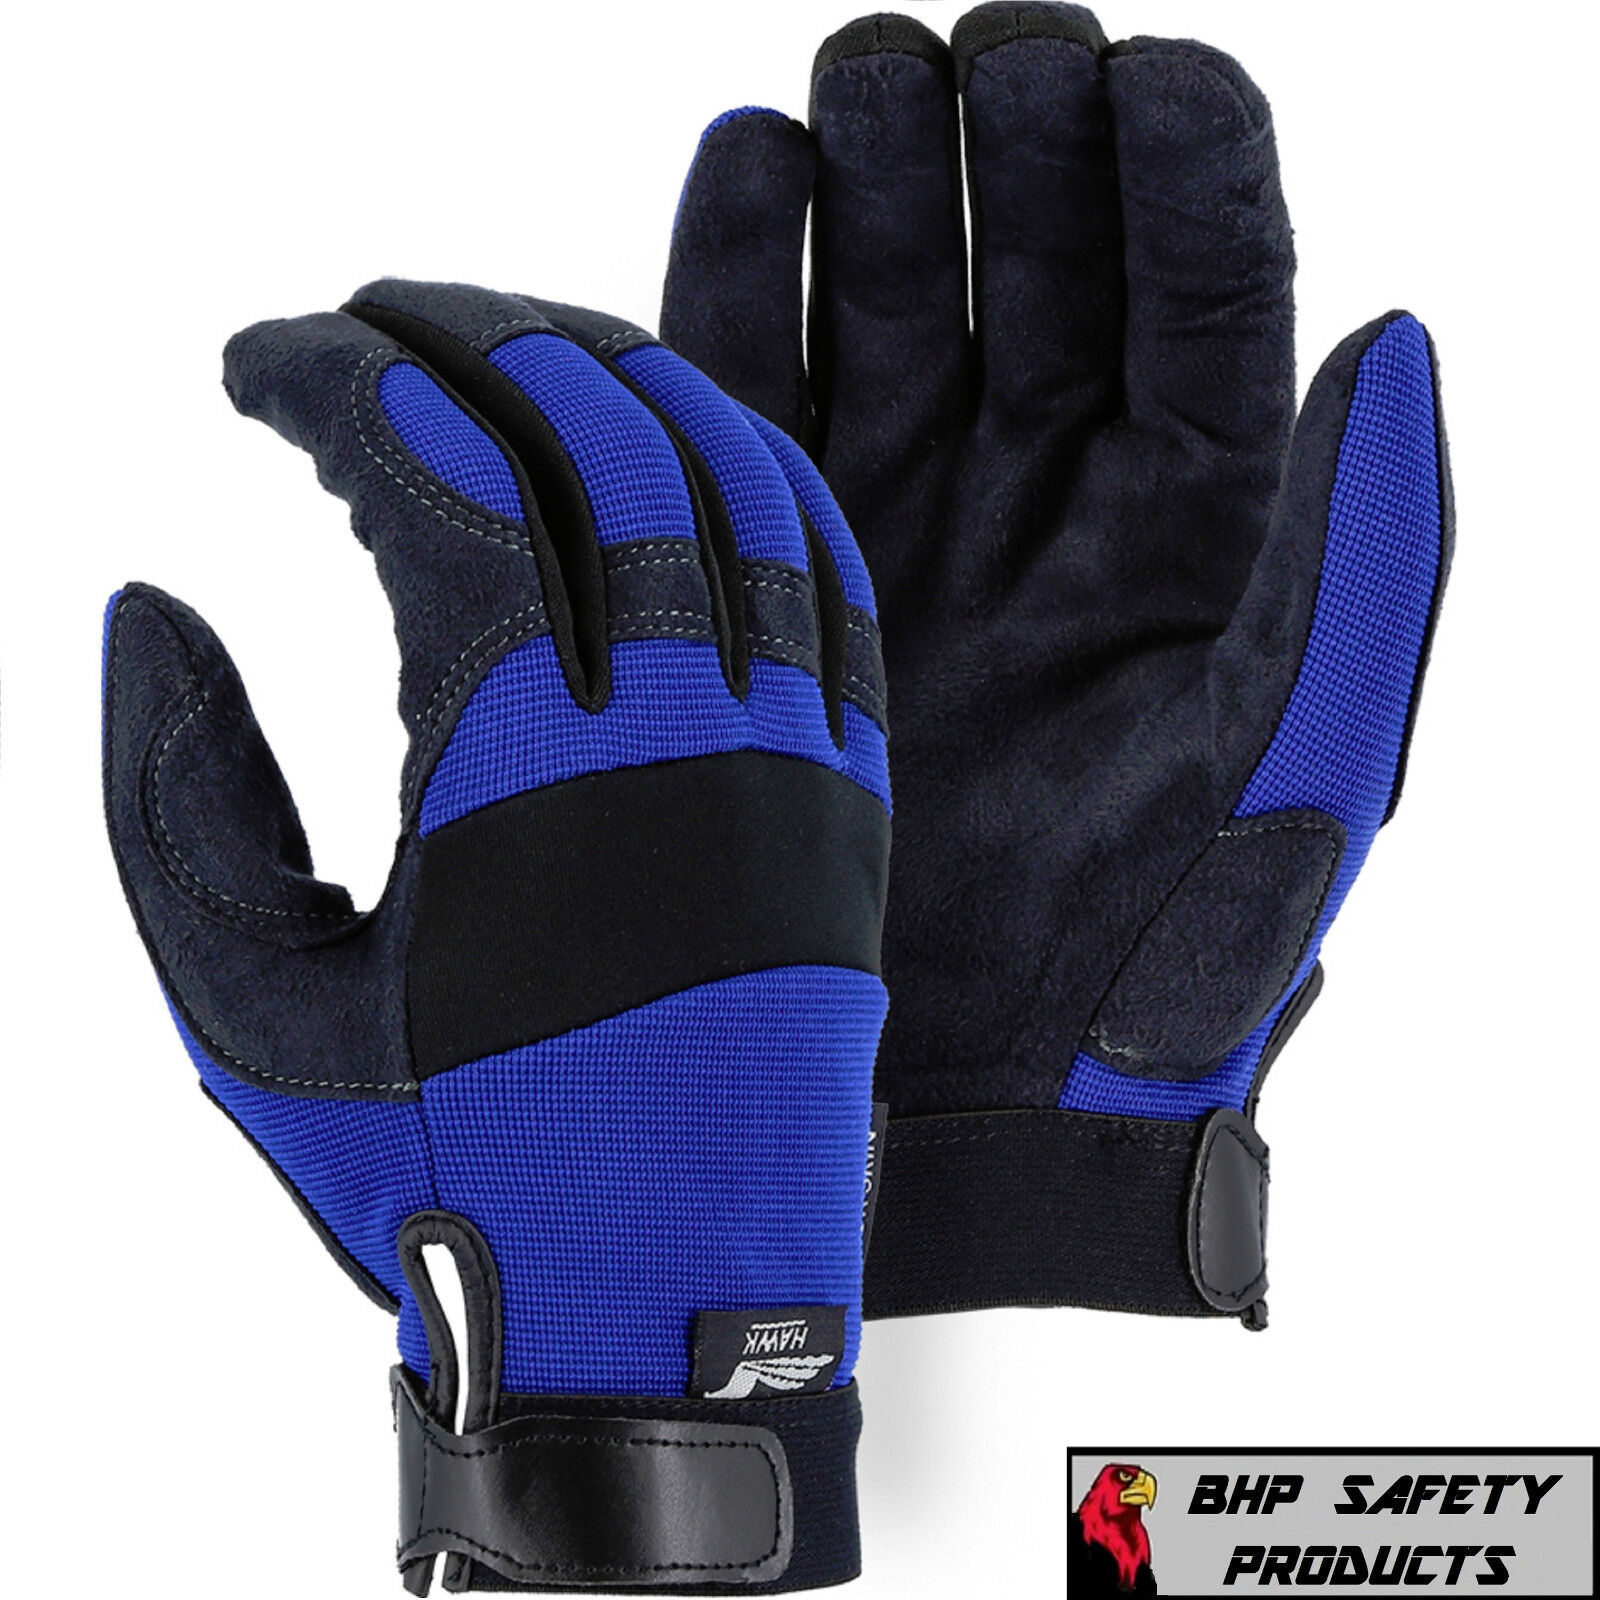 Mechanics Work Gloves Synthetic Leather Amorskin, Majestic G